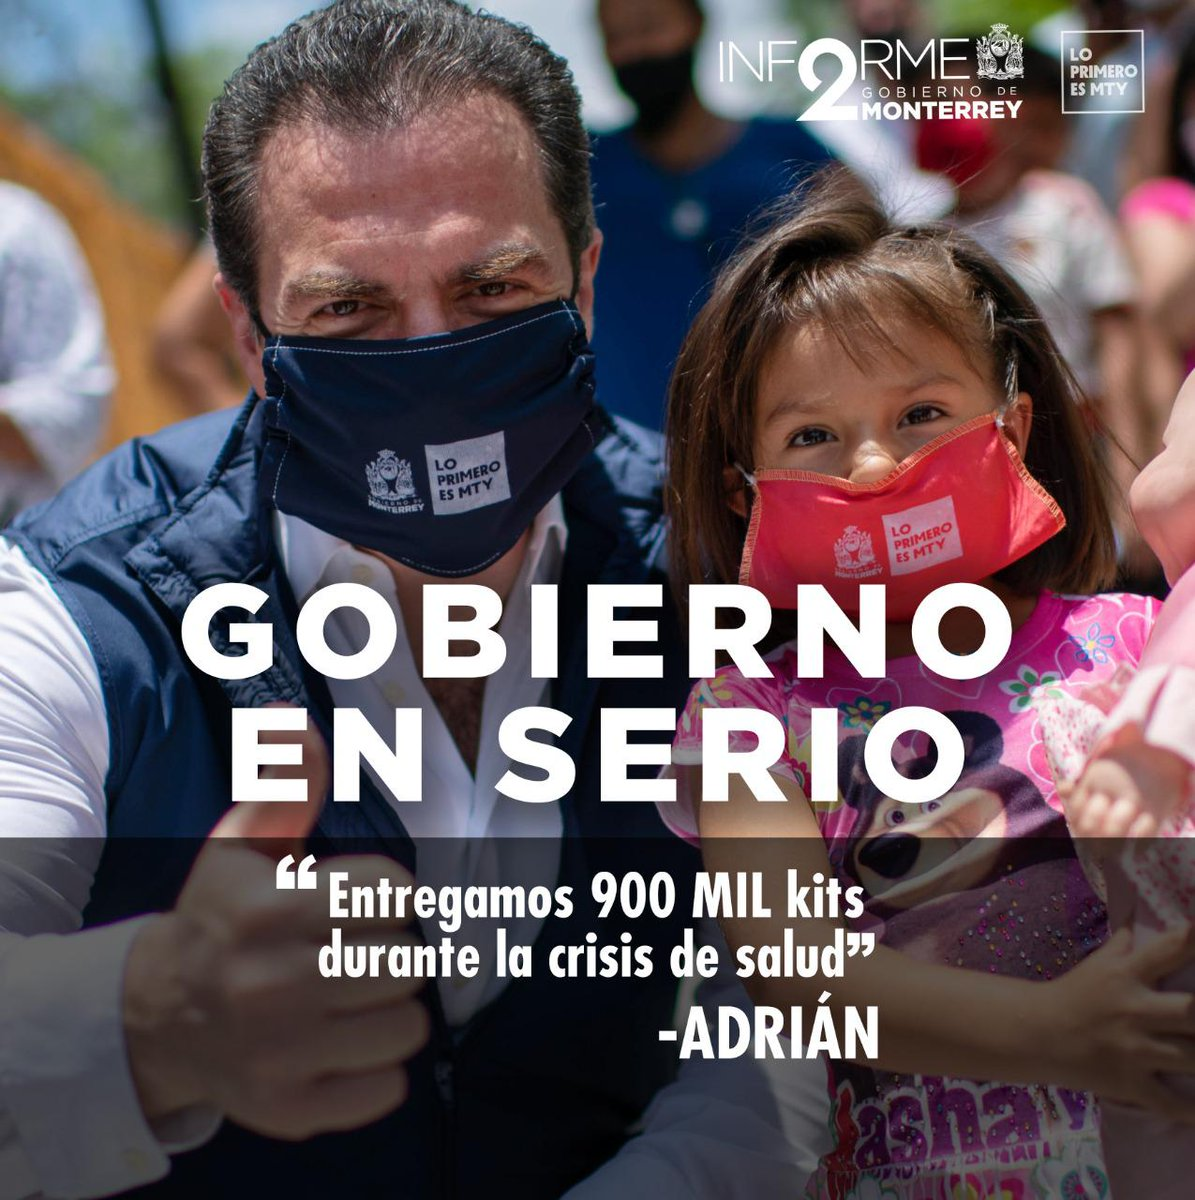 #GobiernoEnSerio #PrimerInformedeGobierno 👊💪 https://t.co/ZpWHlC4NIy